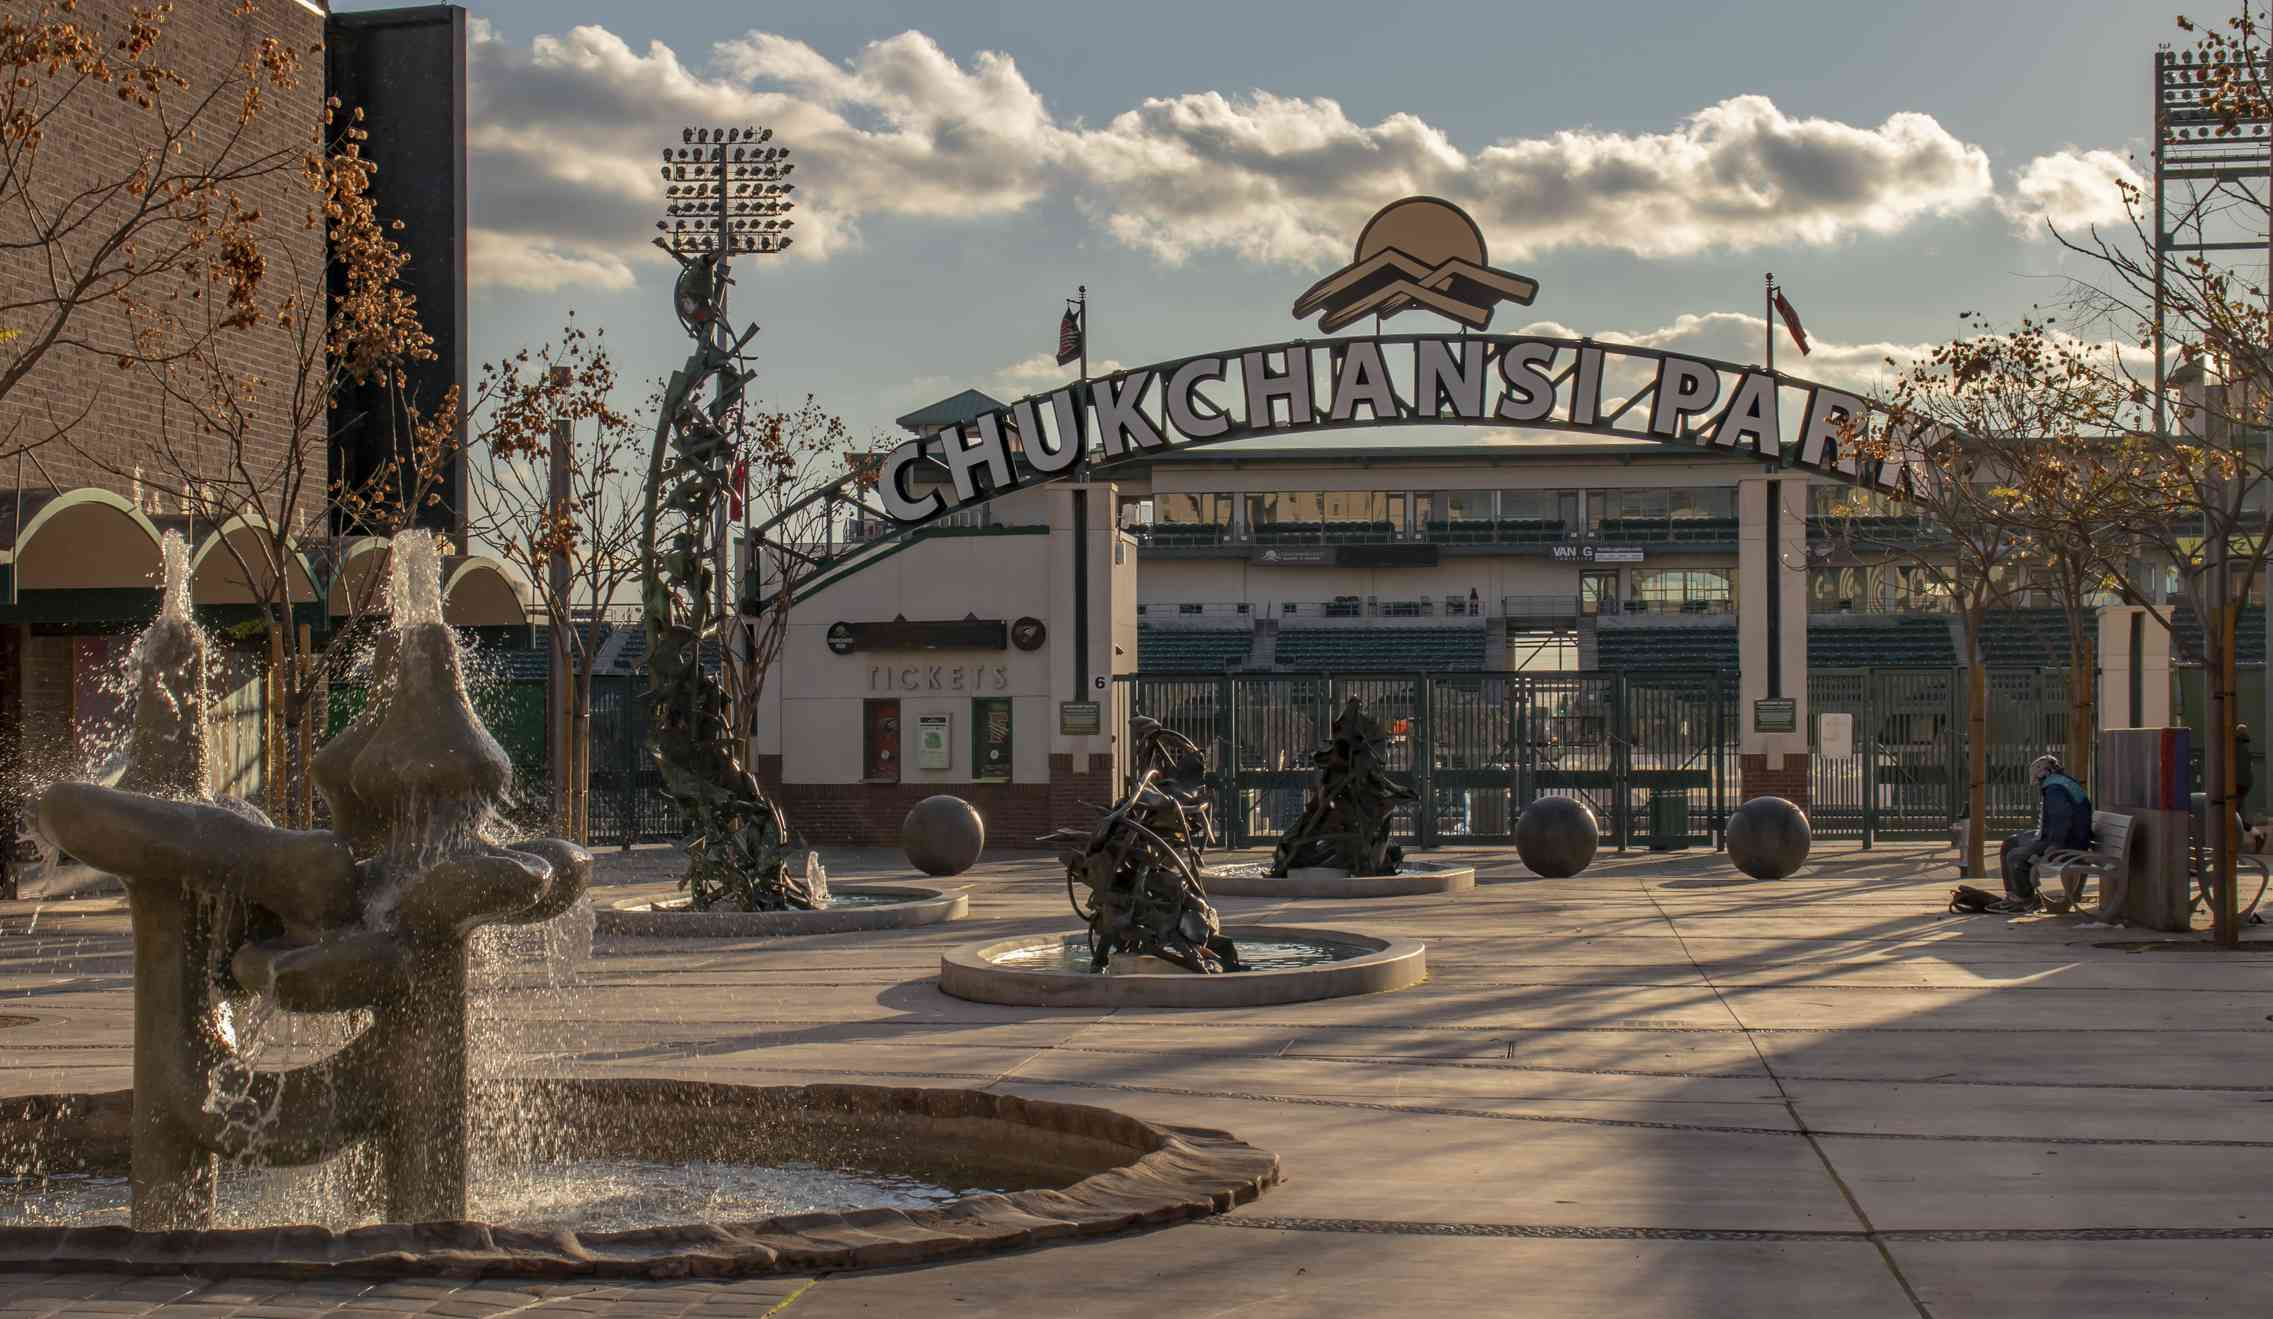 Chukchansi Park baseball stadium in Downtown Fresno